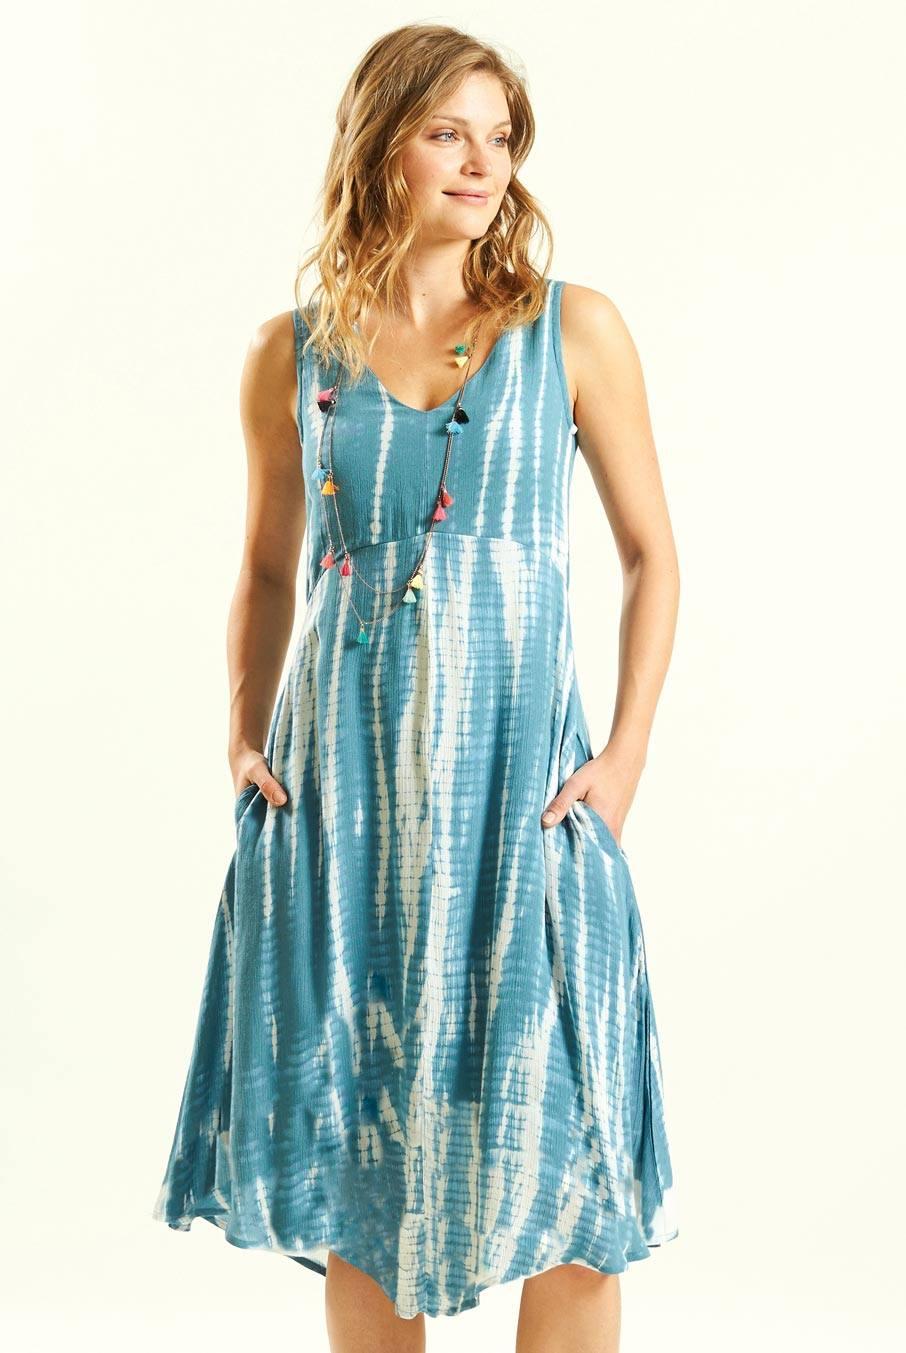 061d973630d Batikované šaty modré ⋆ Green butik